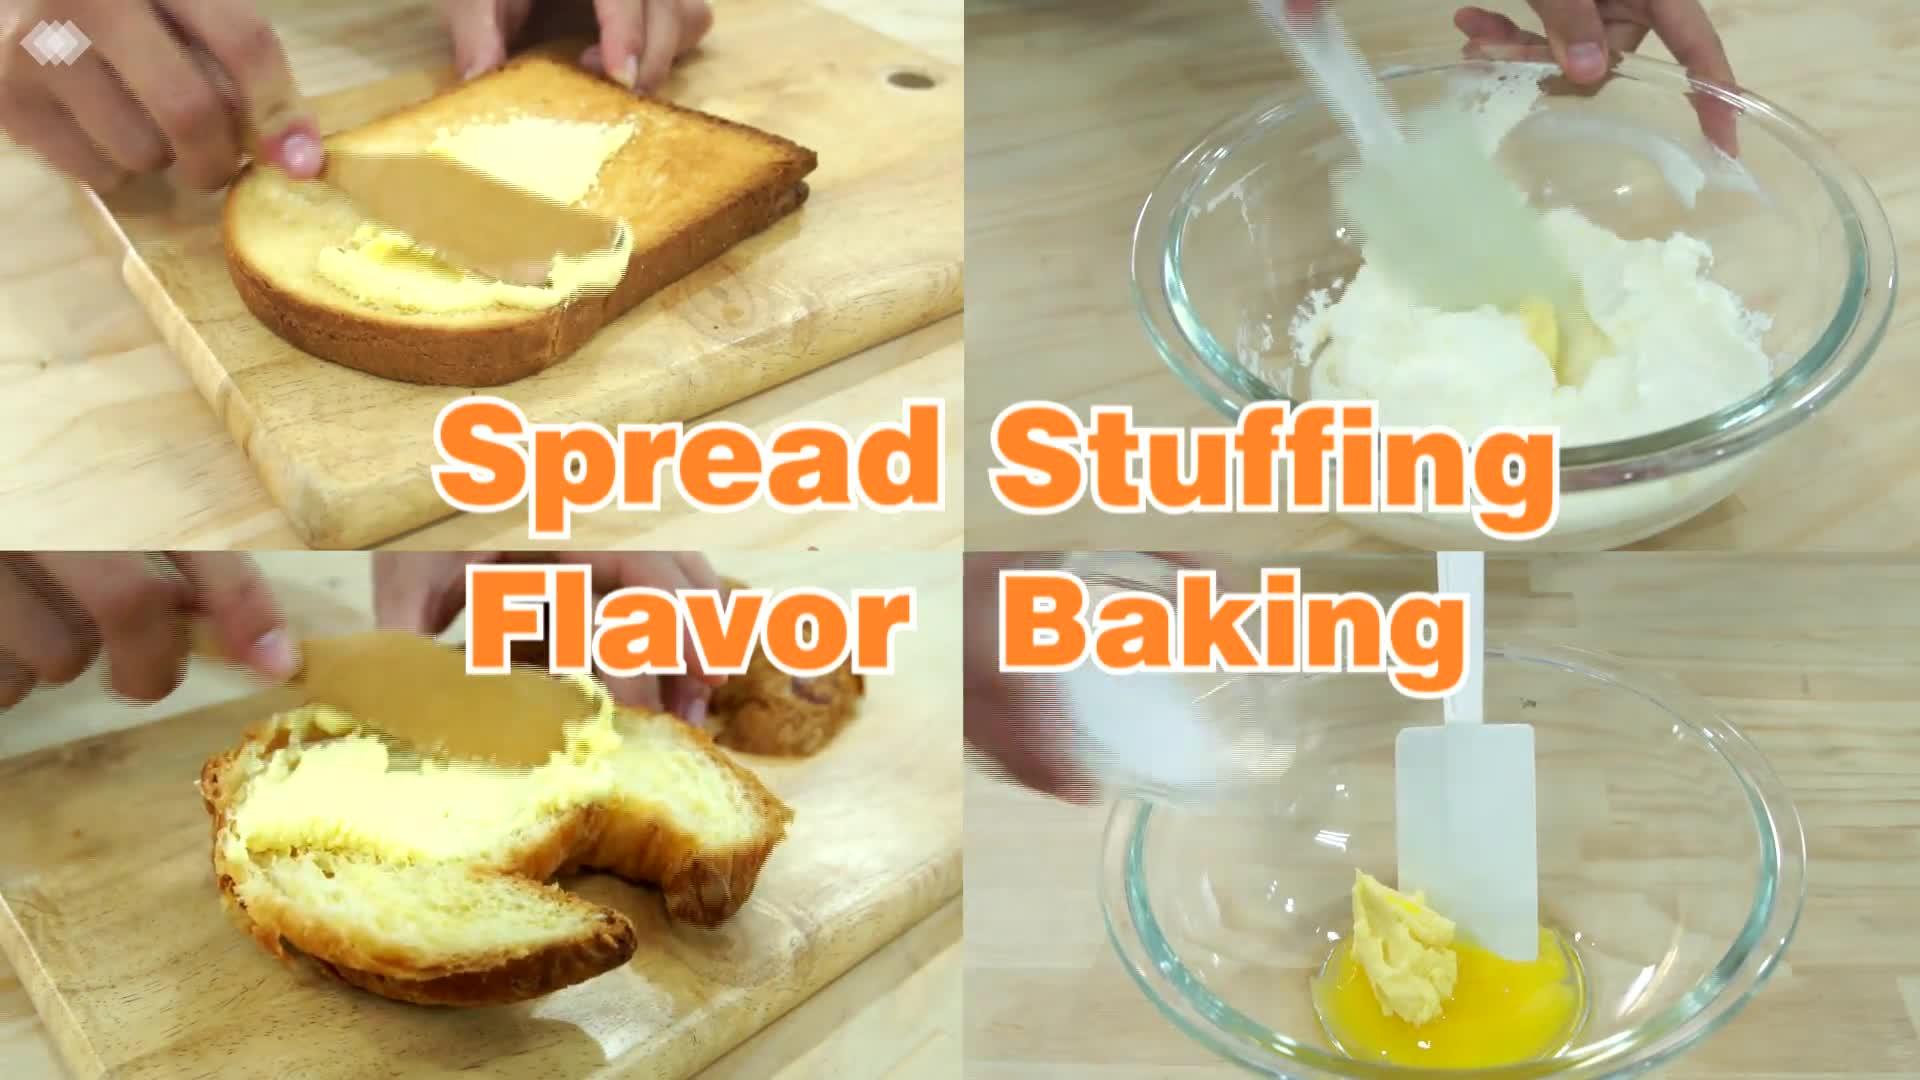 BuQa - Vegan Cream Milk Custard, Paste, Sweet Sauce for bread 220G